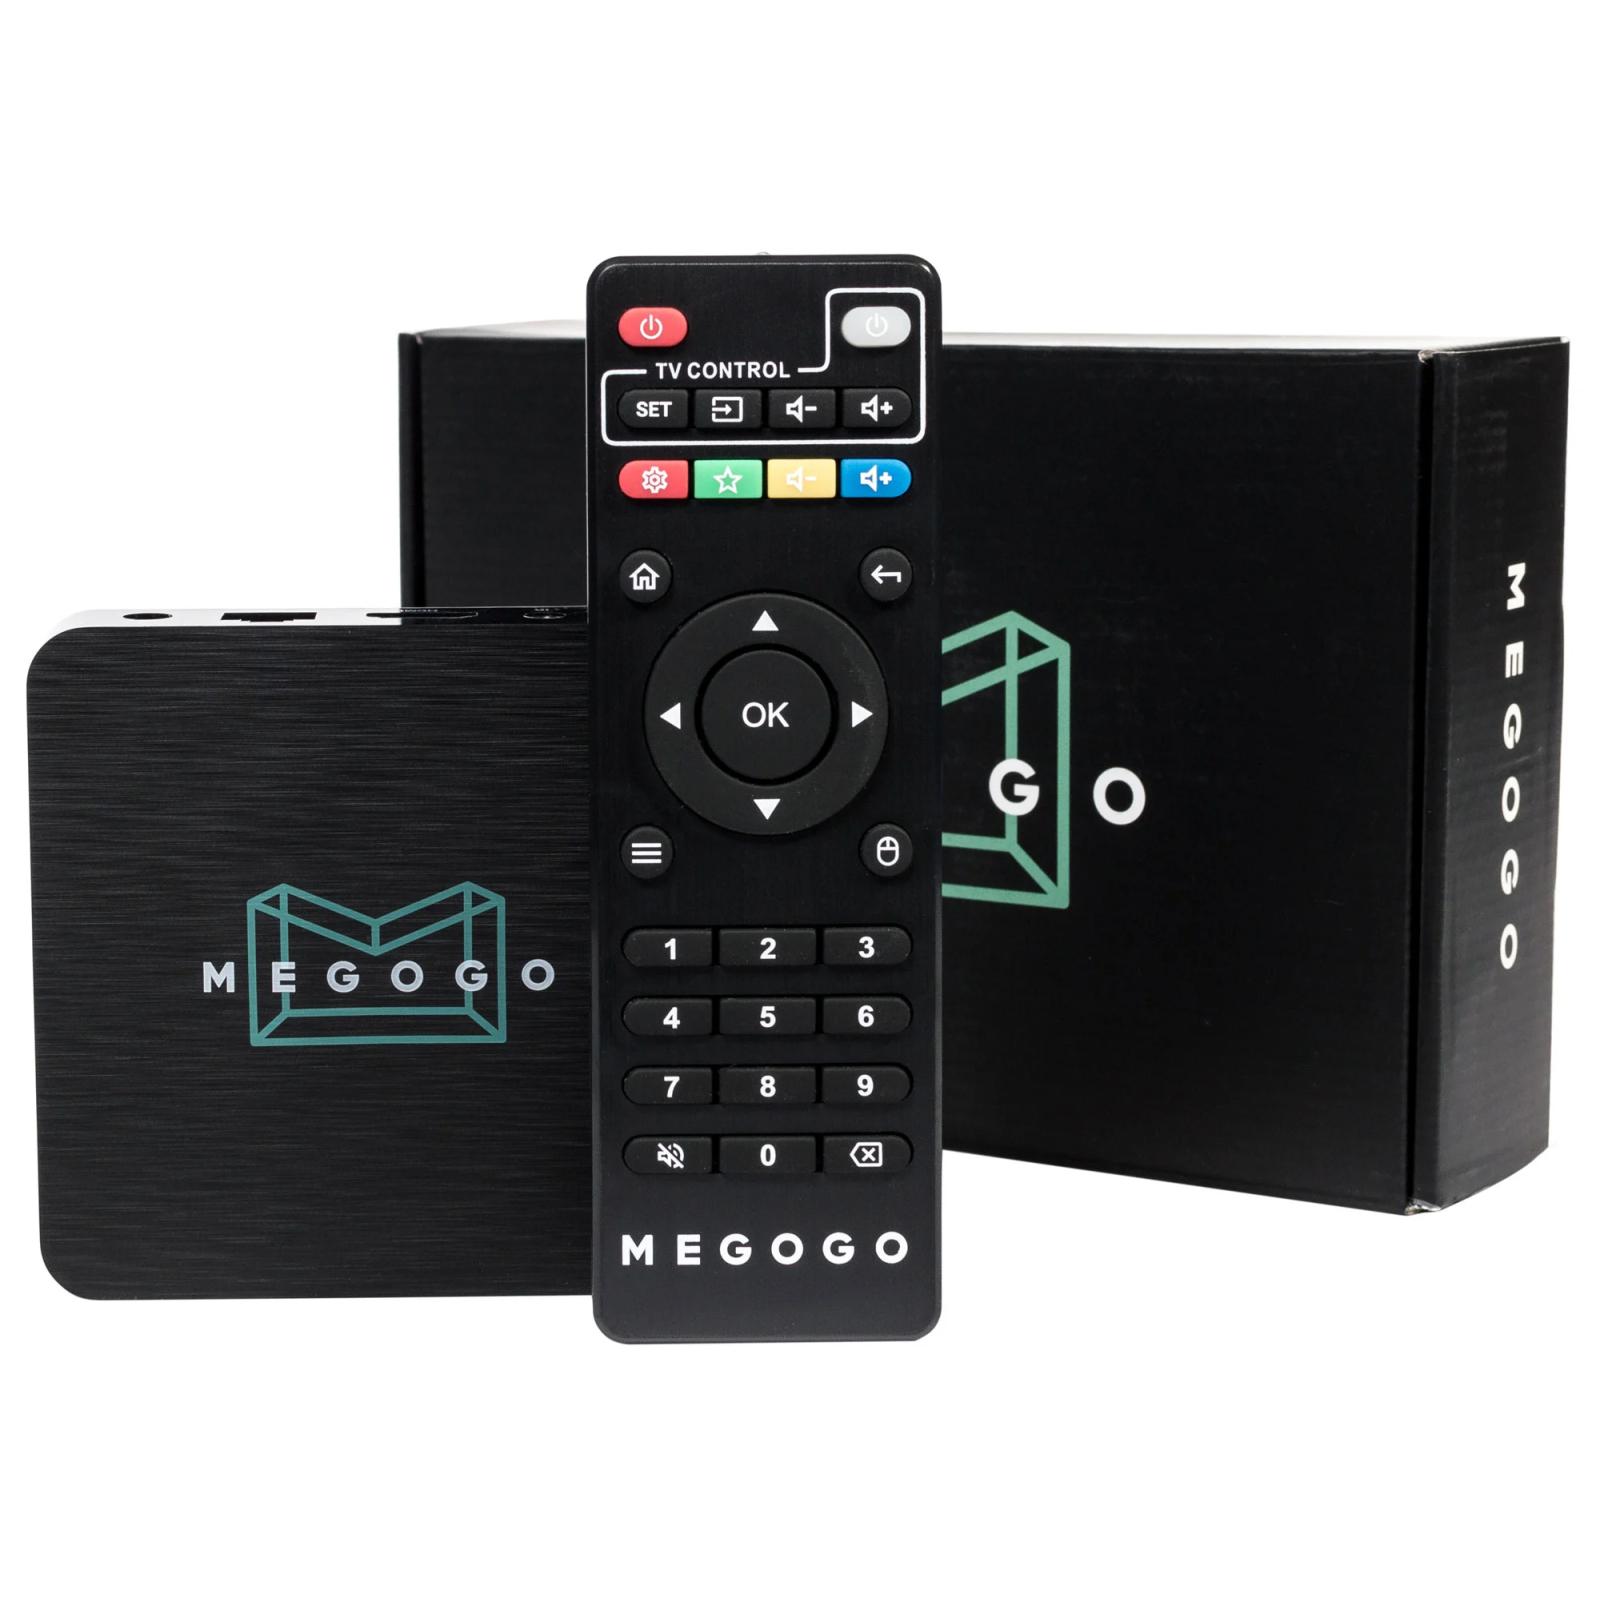 Медиаплеер iNeXT TV4 MEGOGO